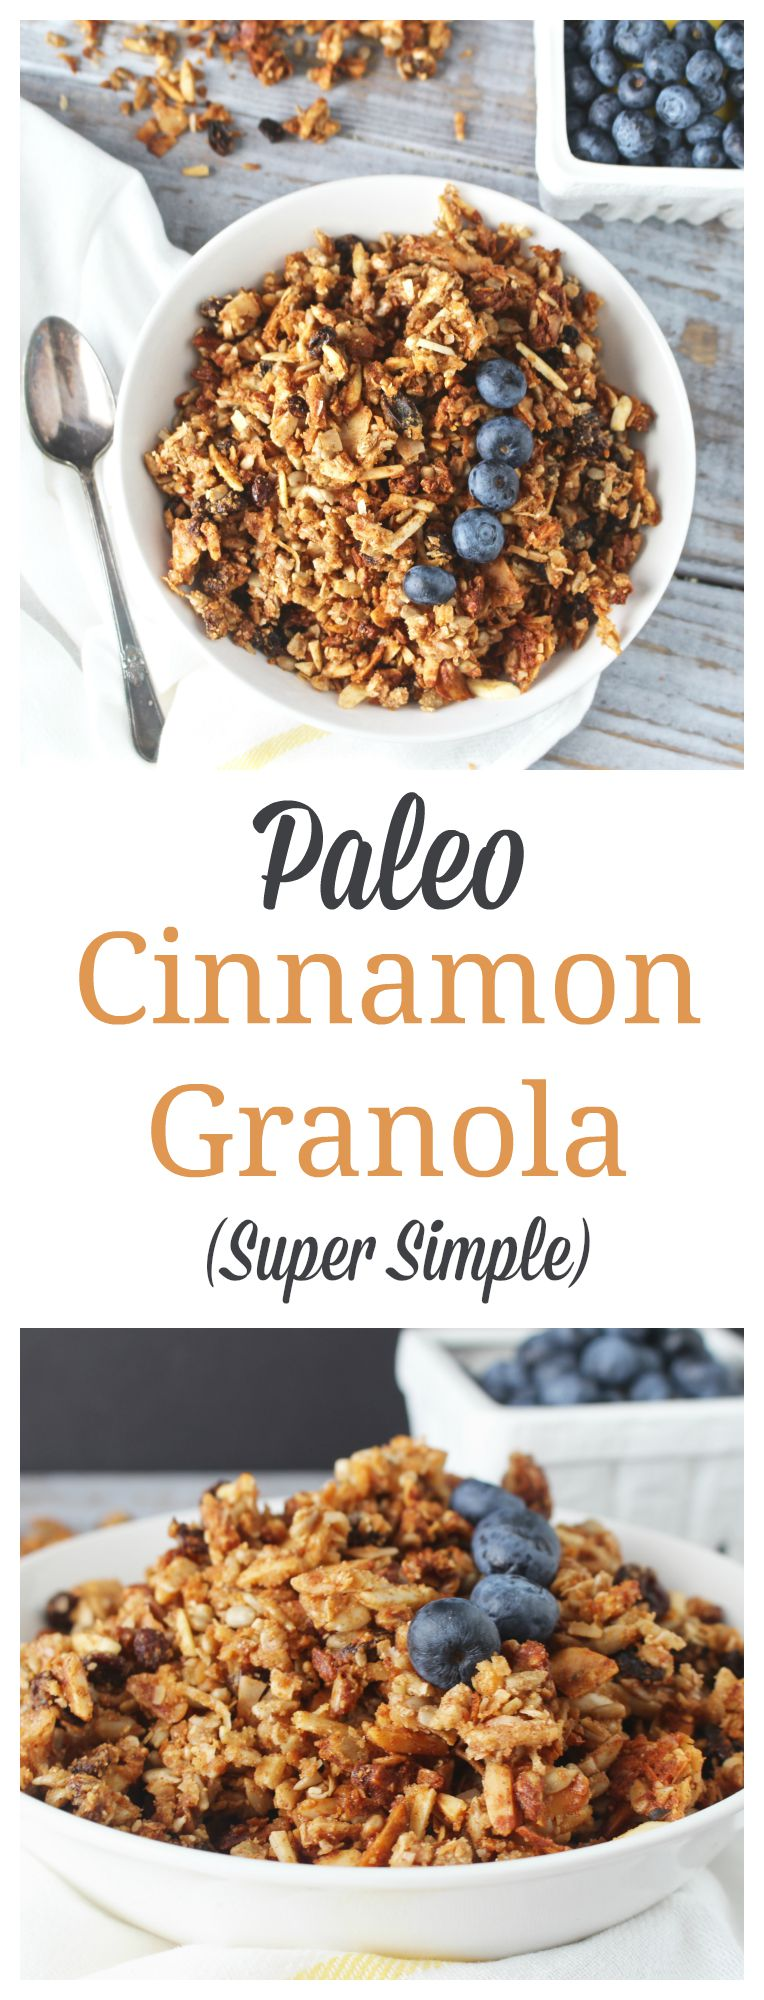 Paleo Cinnamon Granola